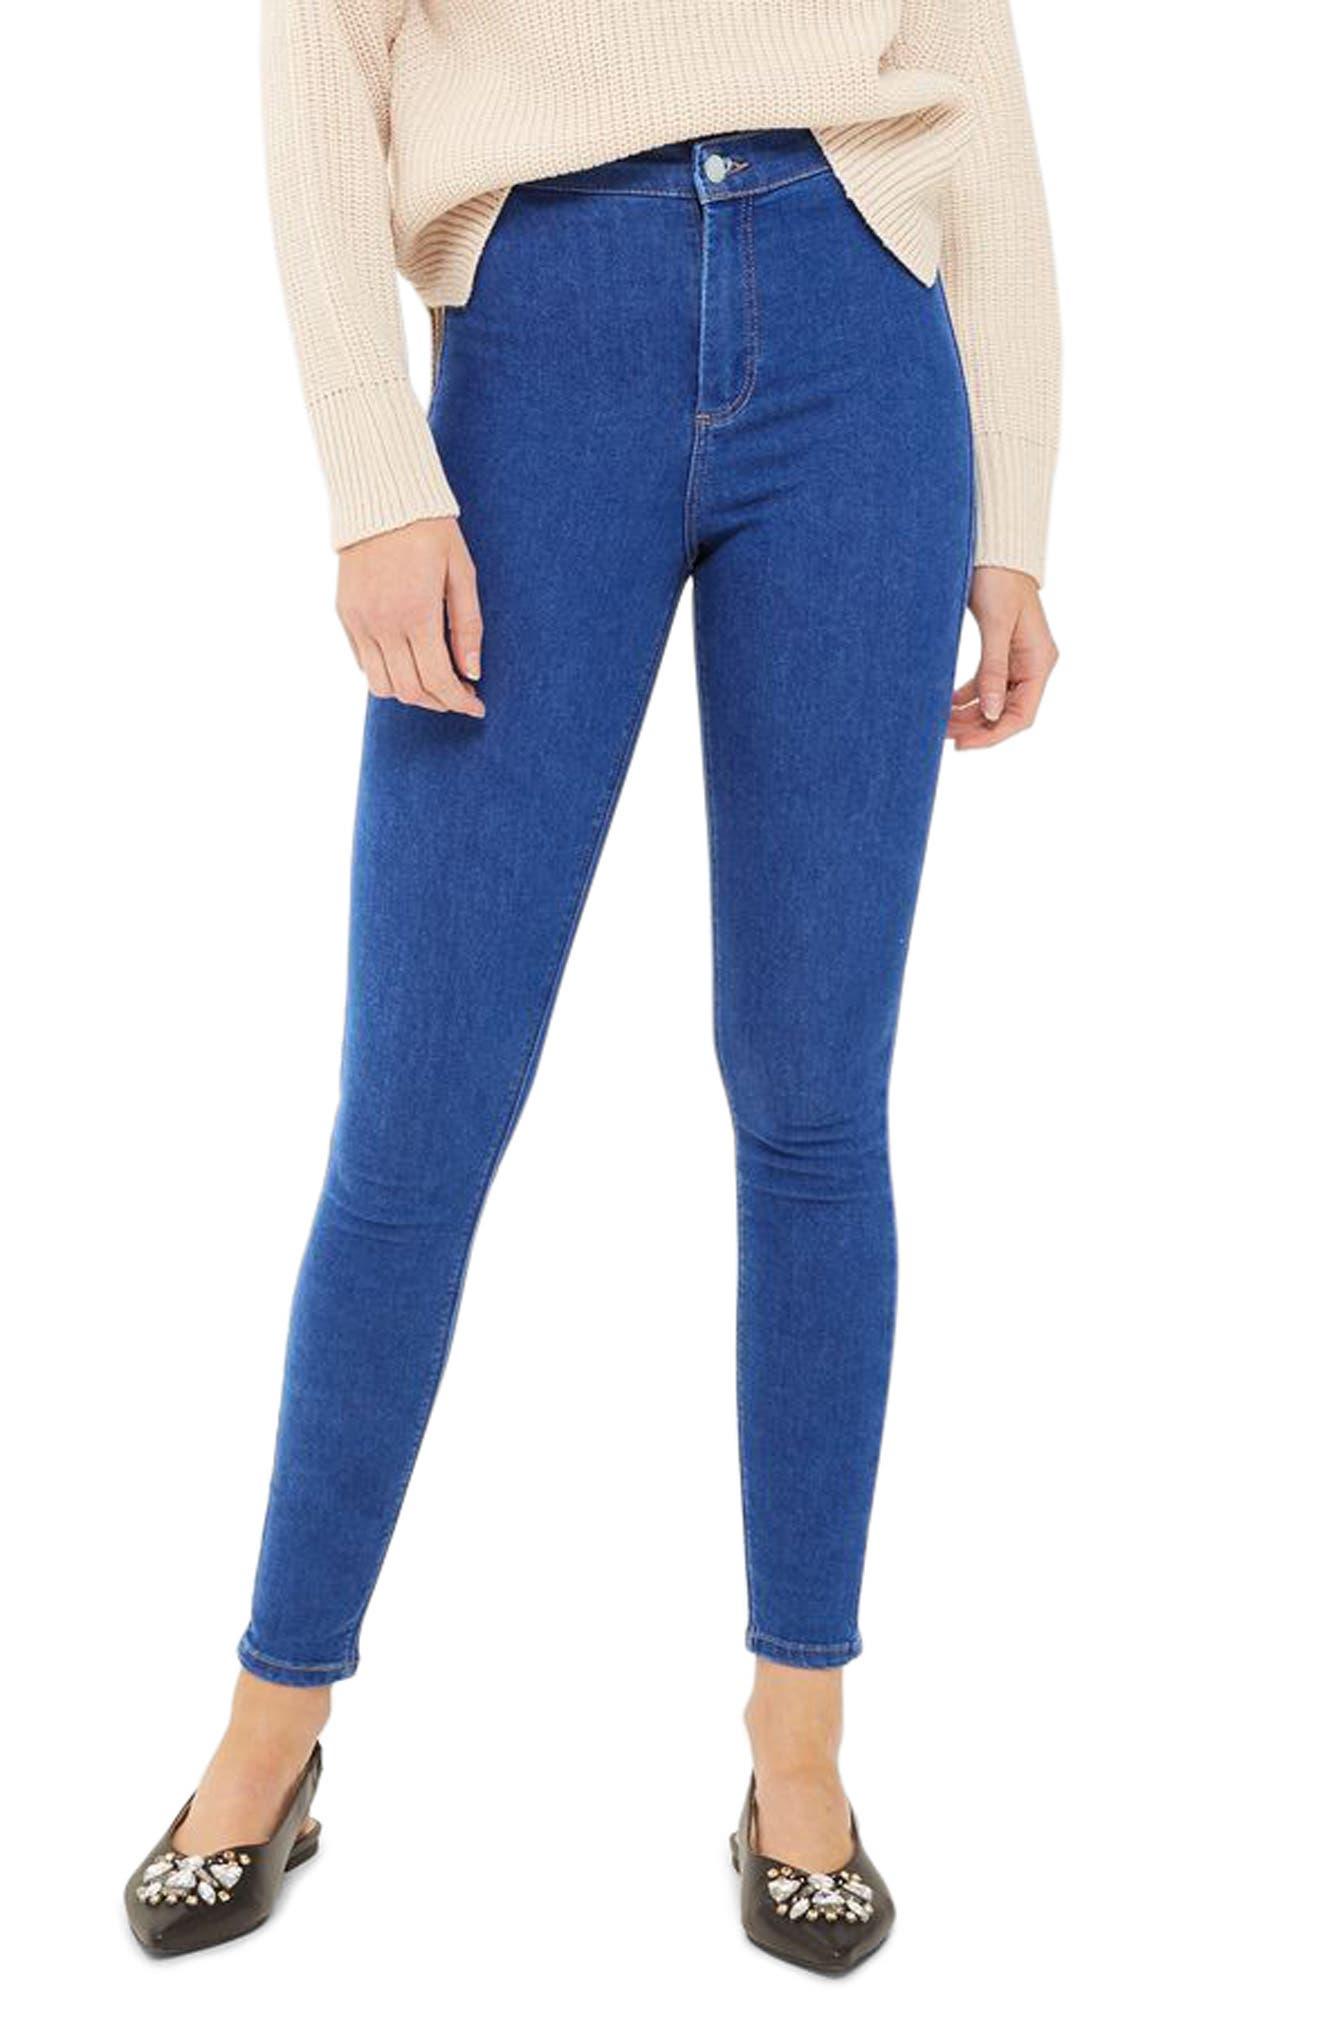 Topshop Joni High Waist Ankle Skinny Jeans